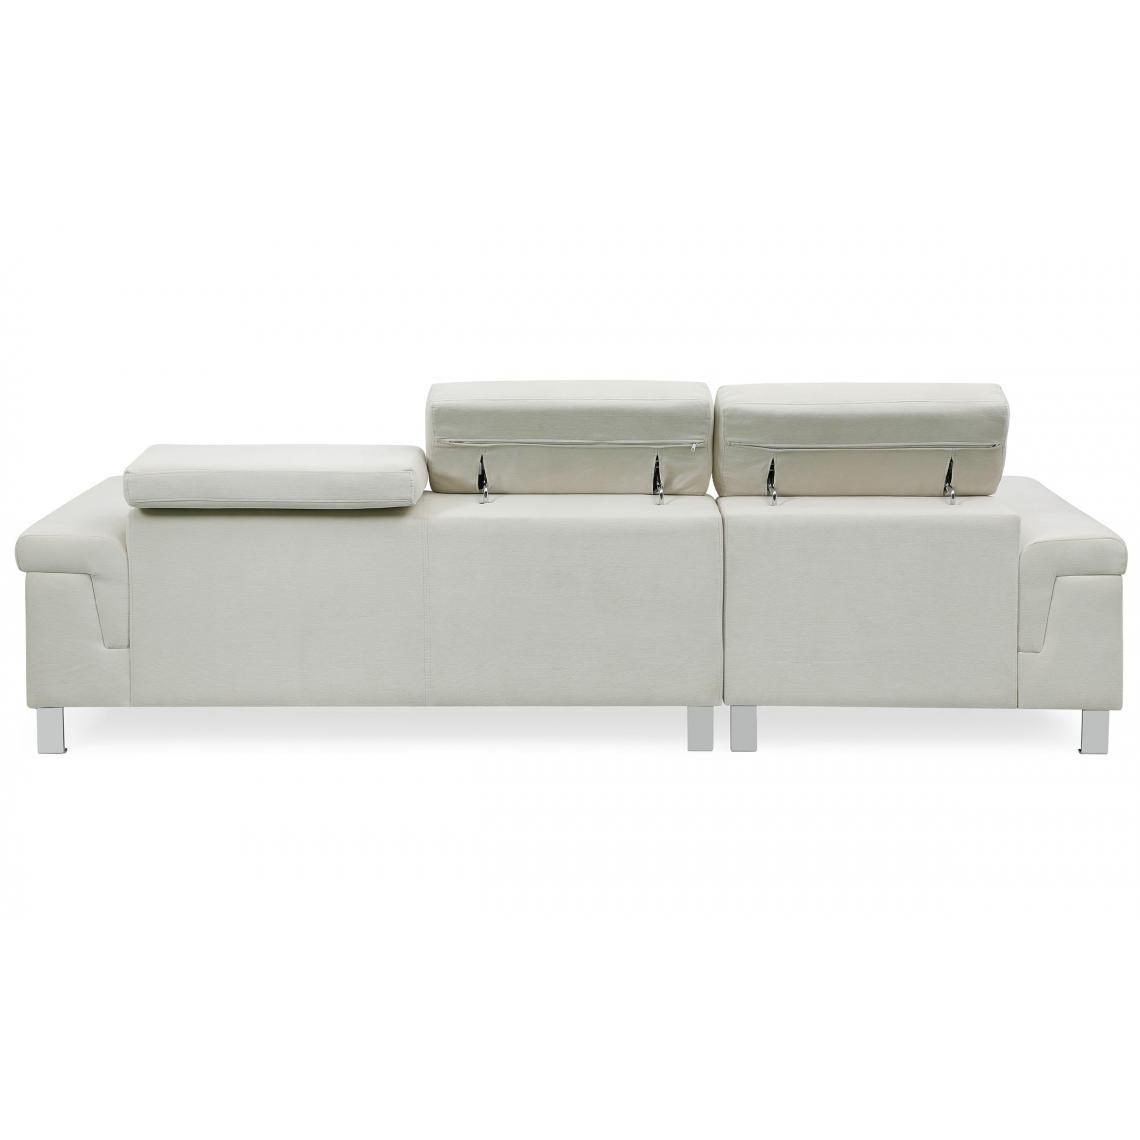 Canapé d'angle en velours Beige IRINA mvX88